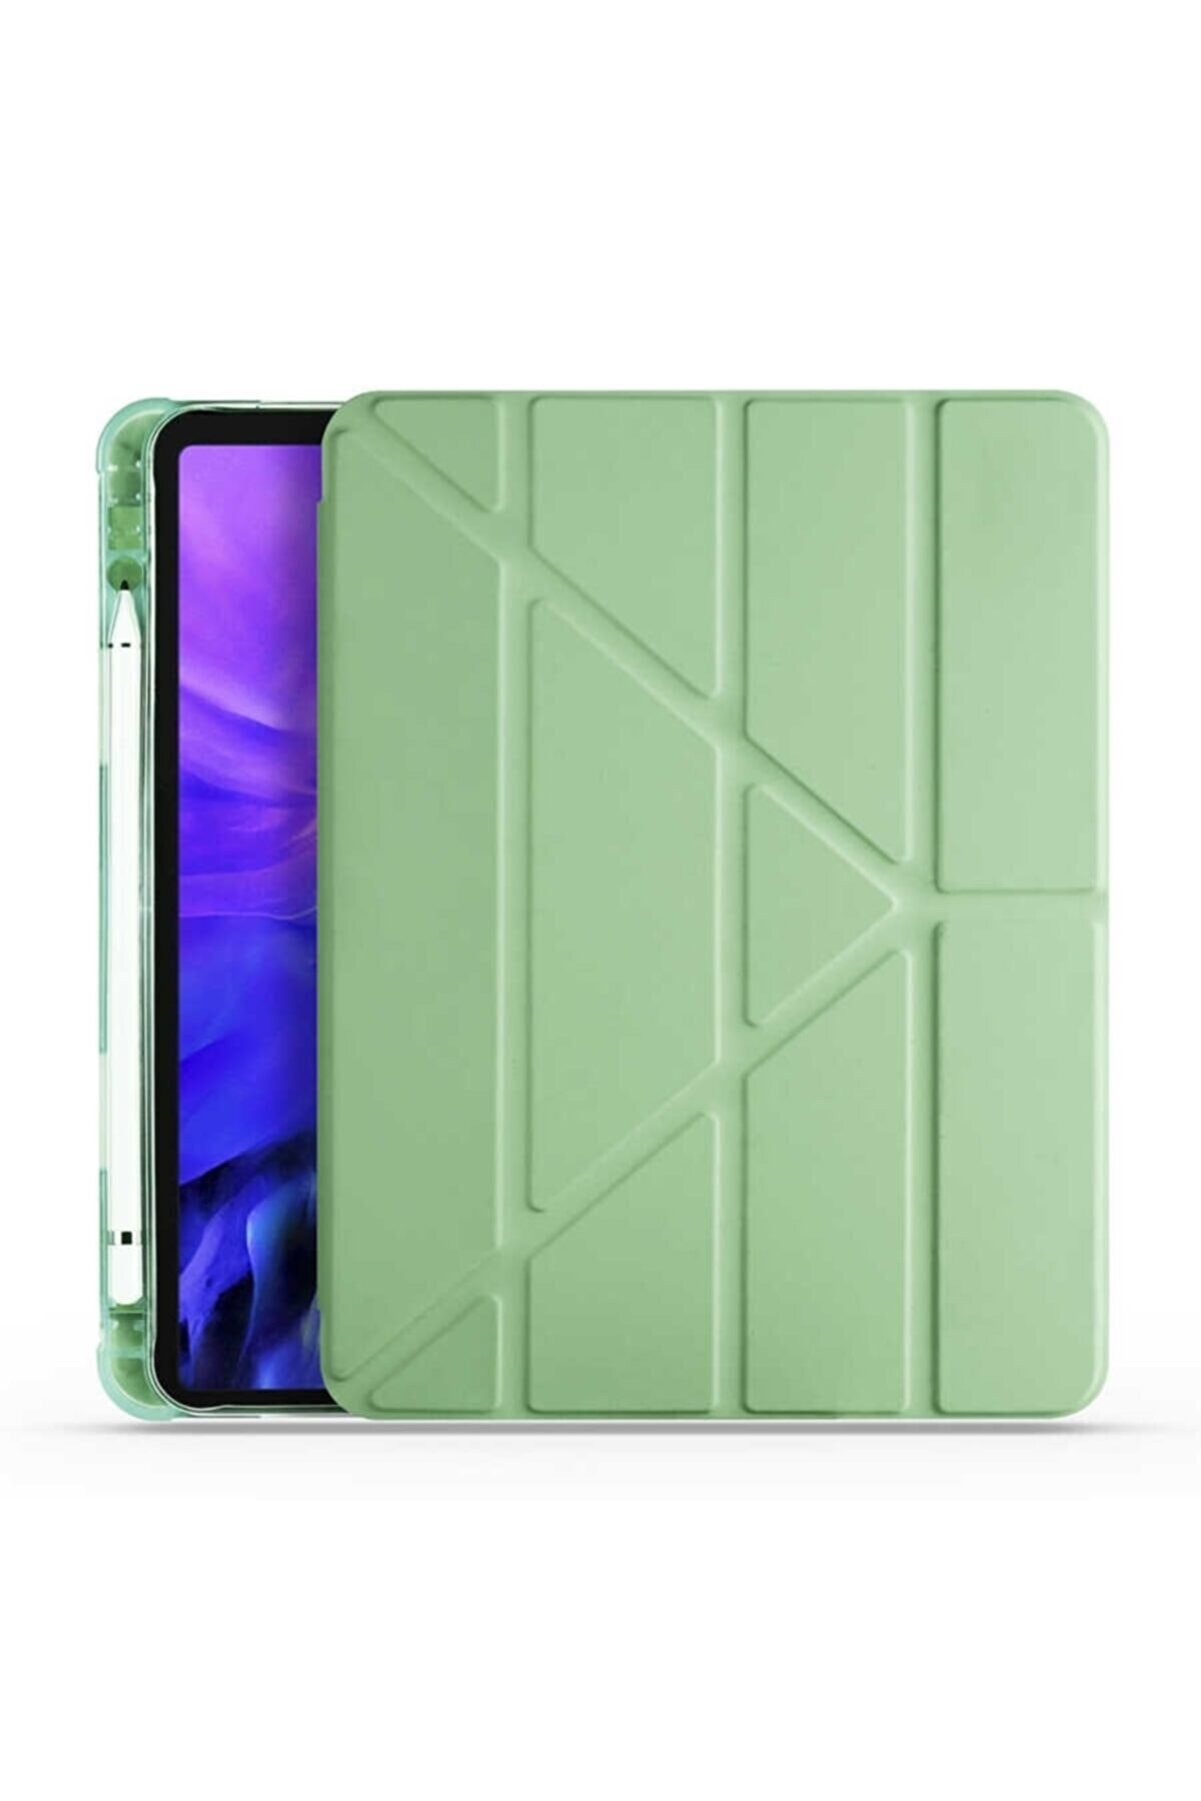 Samsung Galaxy Tab S6 Lite P610 Kılıf Tri Folding Smart Cover Standlı Kalemlikli Kapak Yeşil